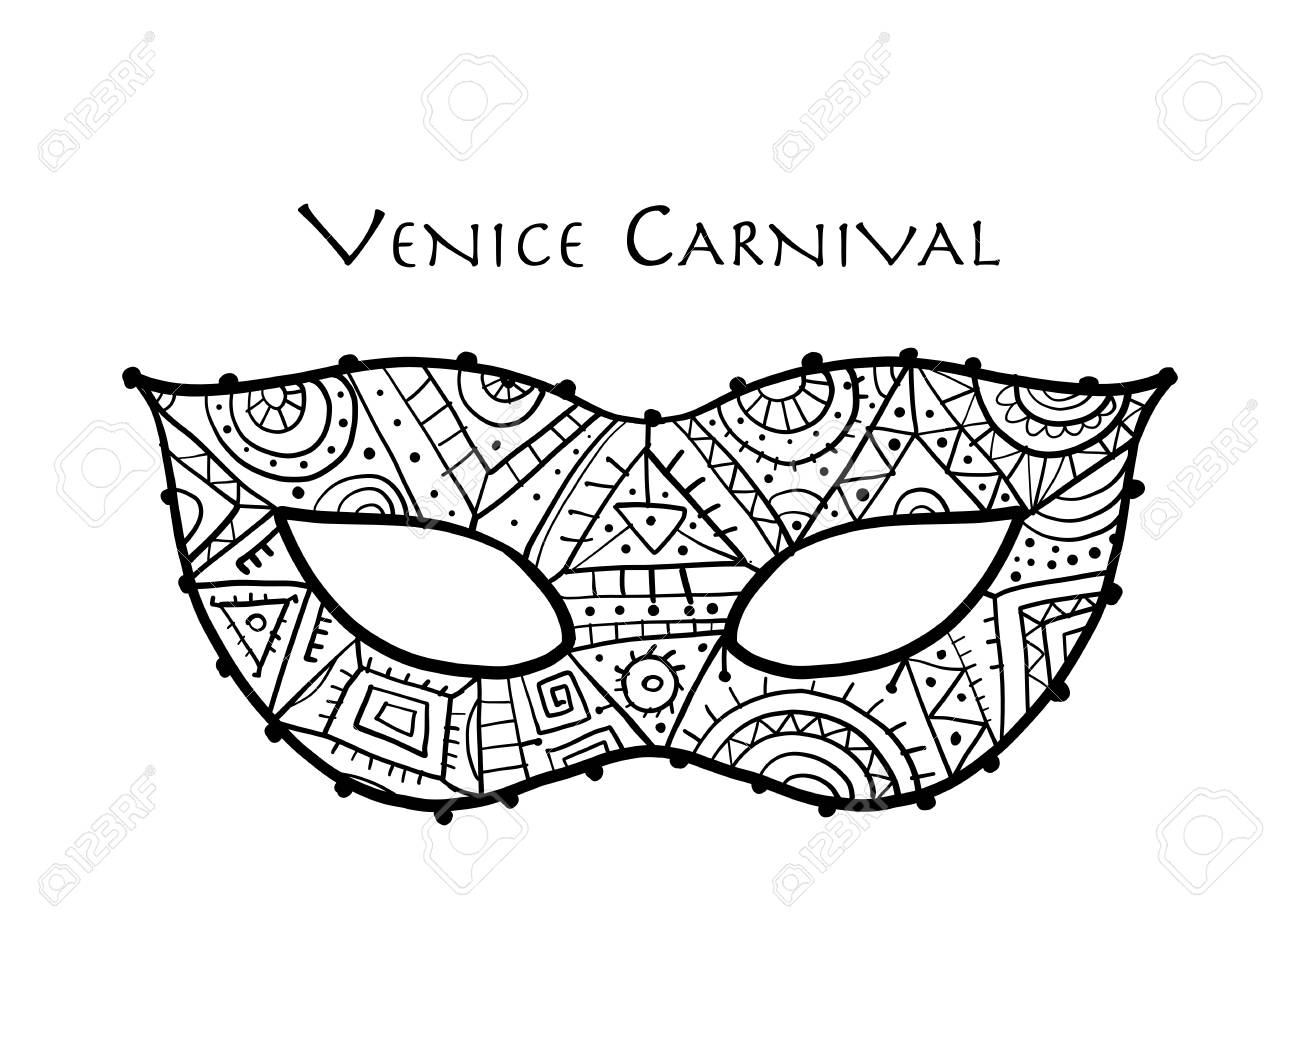 Carnival venetian mask ornamental for your design. Vector illustration - 121953849